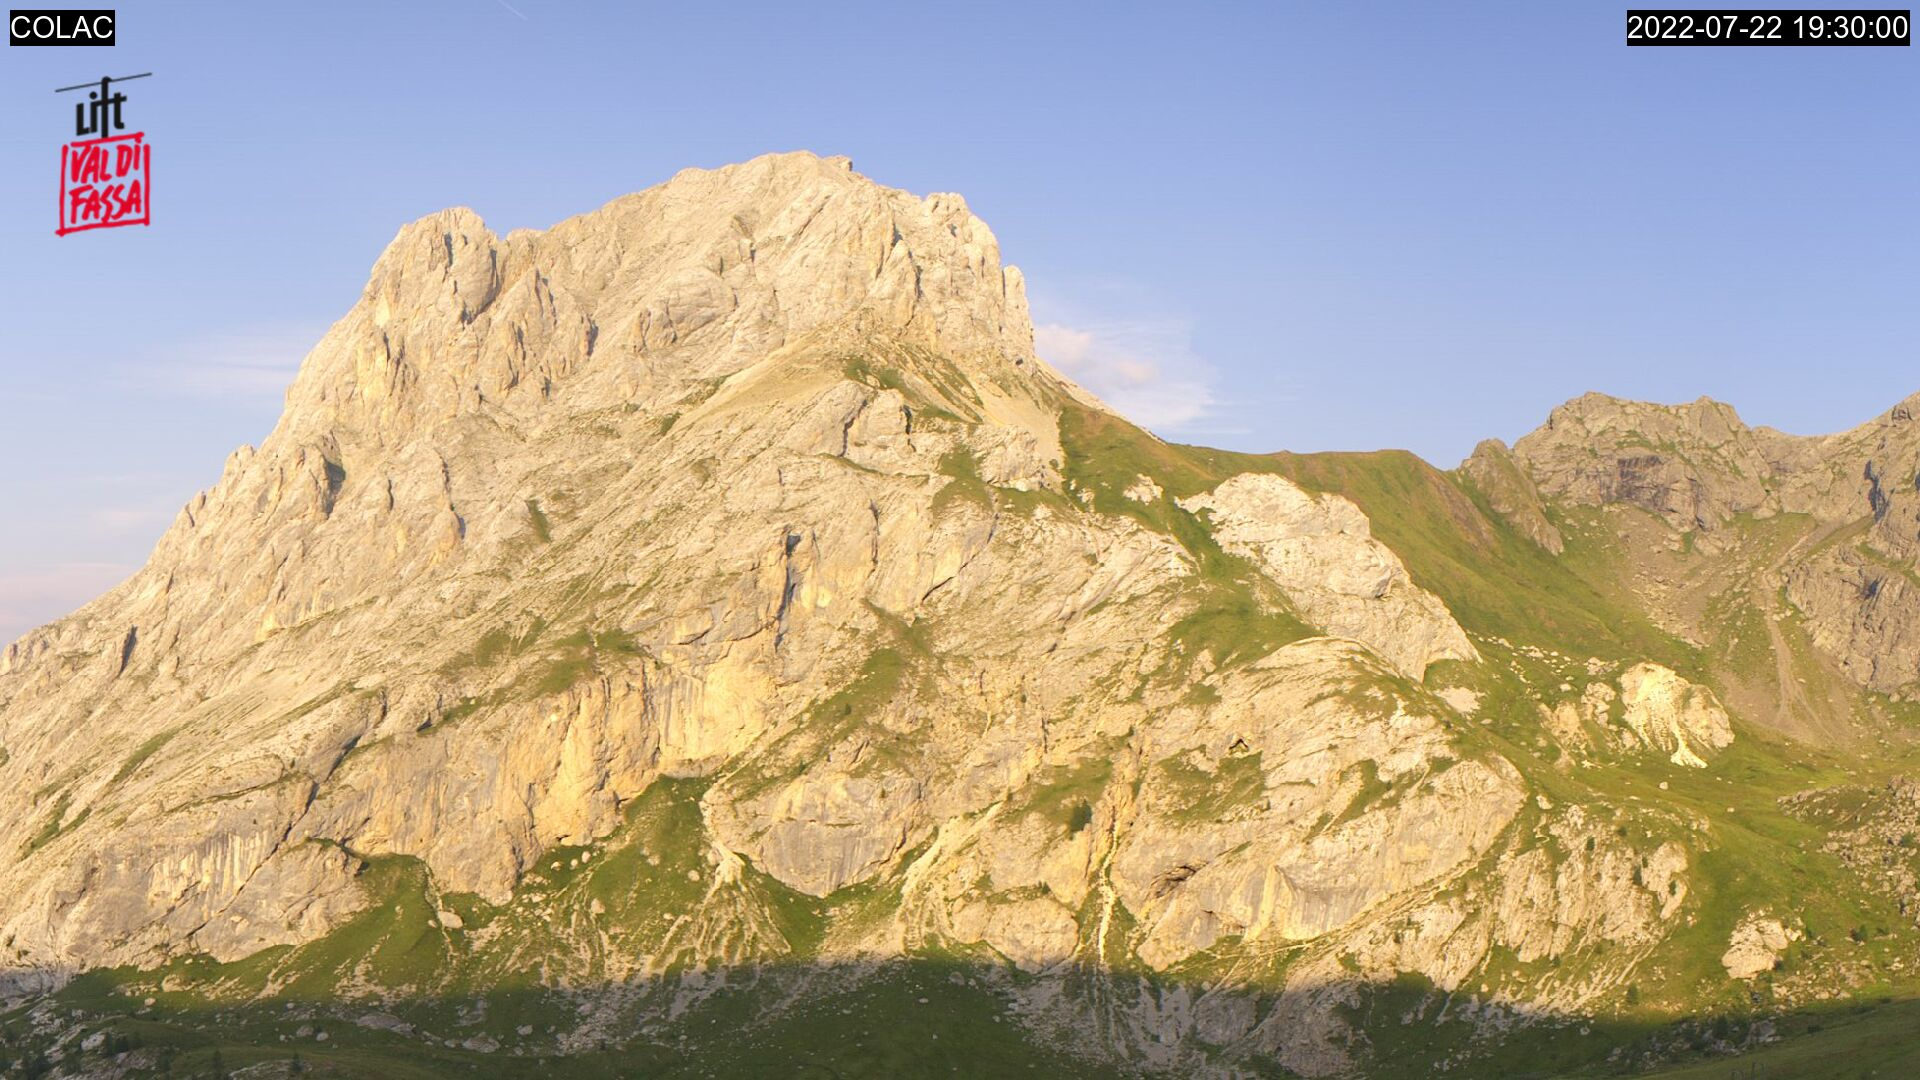 Webkamera - Alba